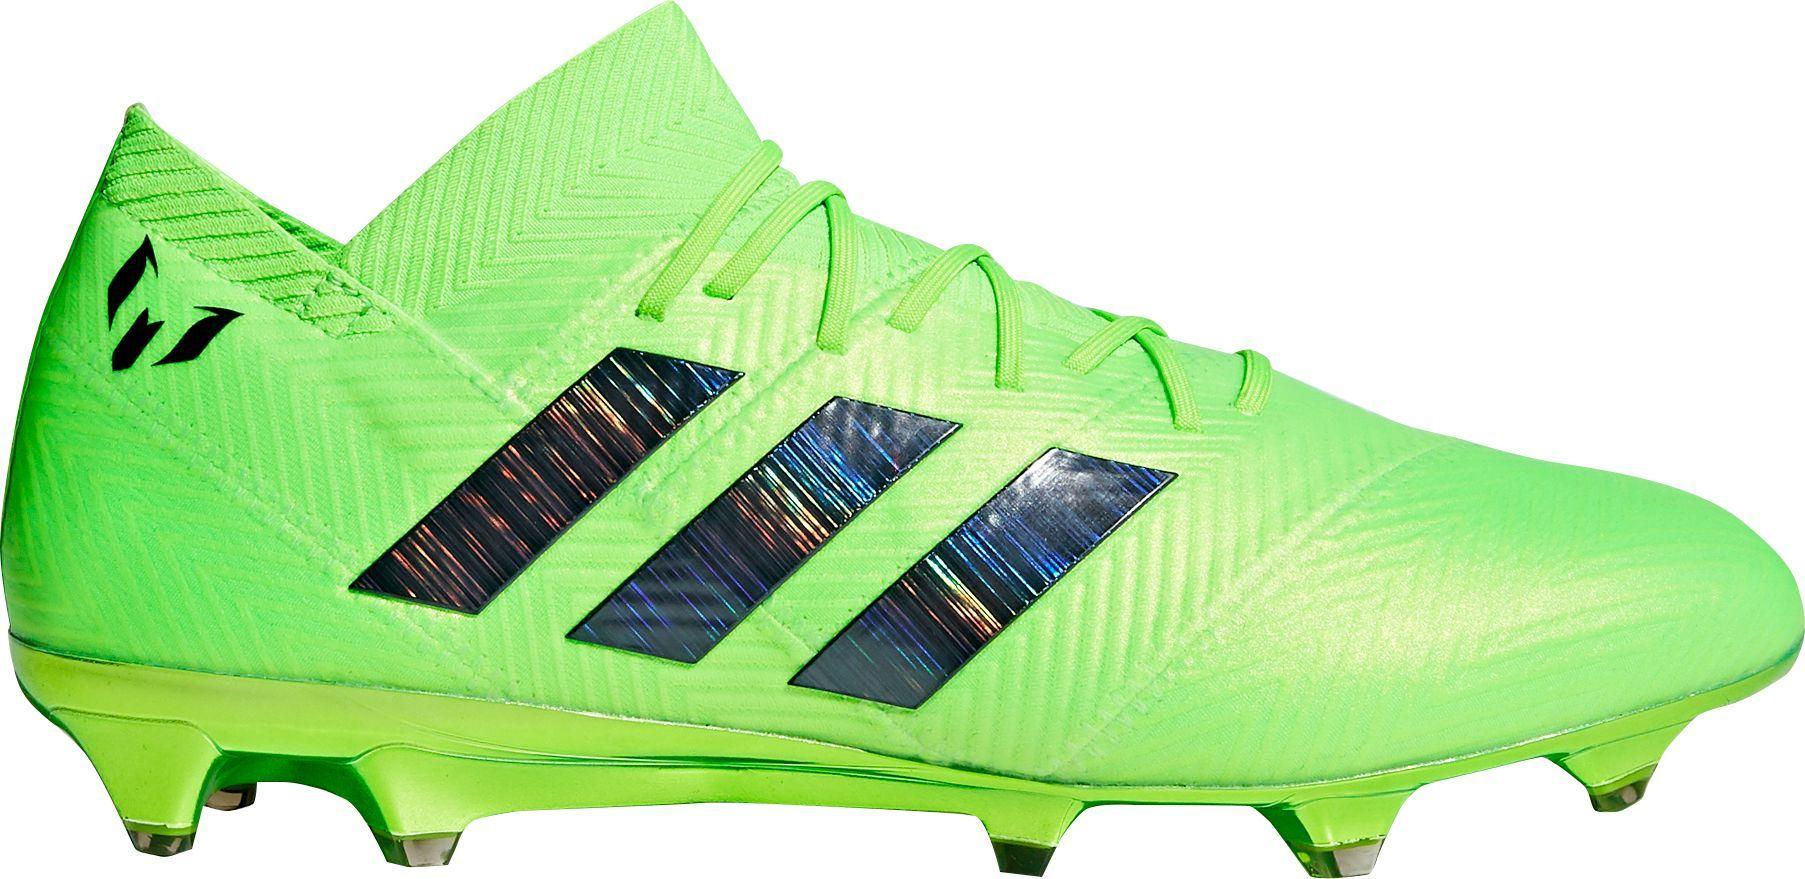 6dd5c79a7b63 adidas Men's Nemeziz Messi 18.1 FG Soccer Cleats | Products | Soccer ...